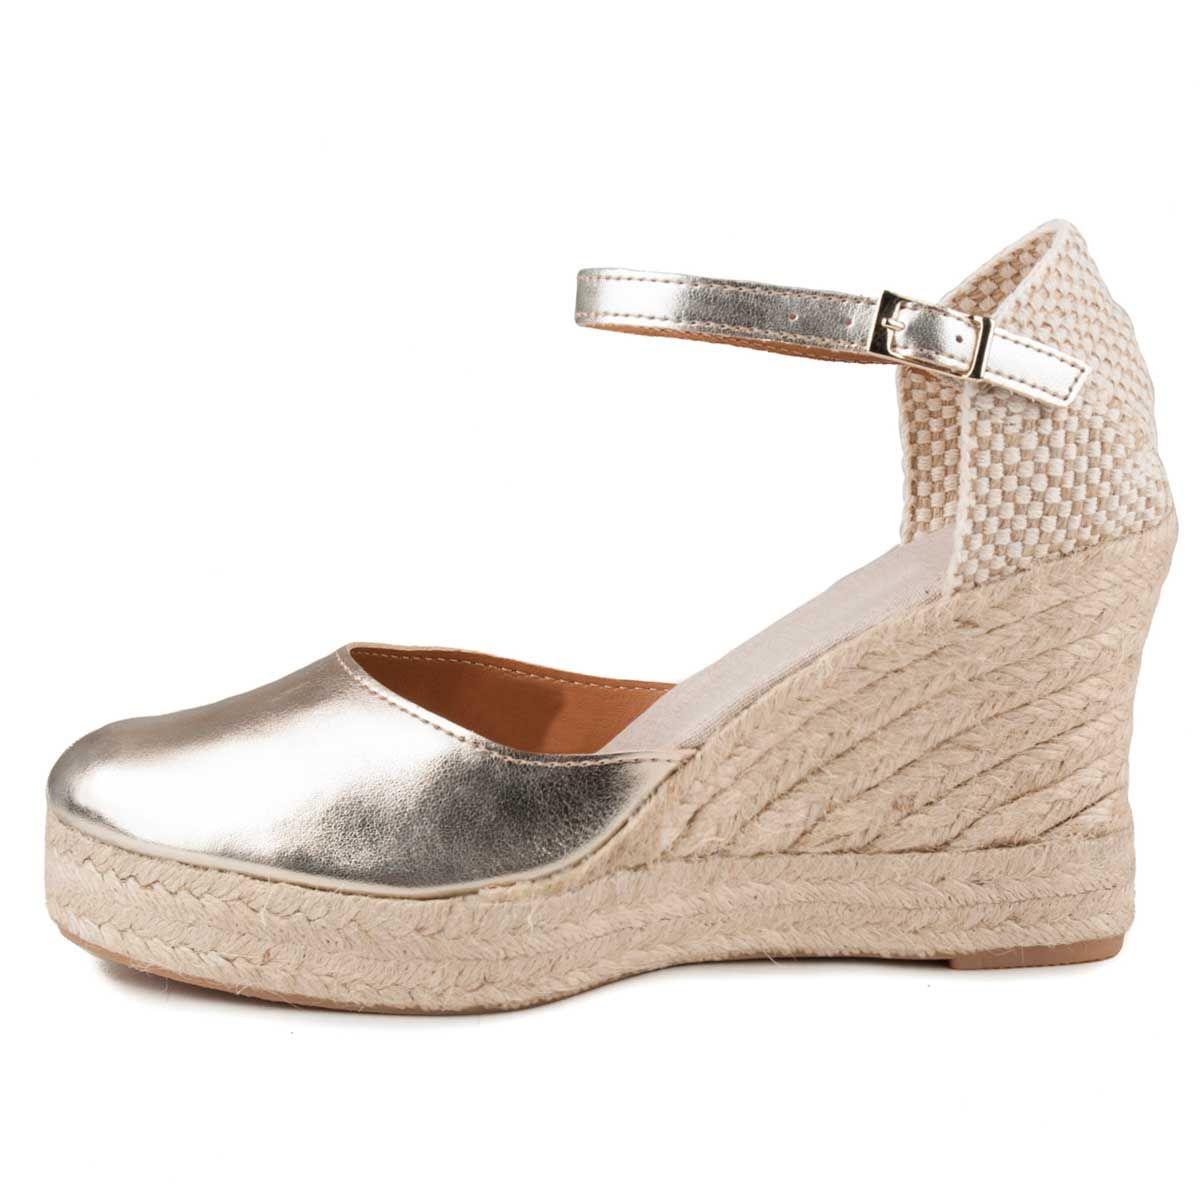 Montevita Ankle Strap Wedge Espadrille in Gold